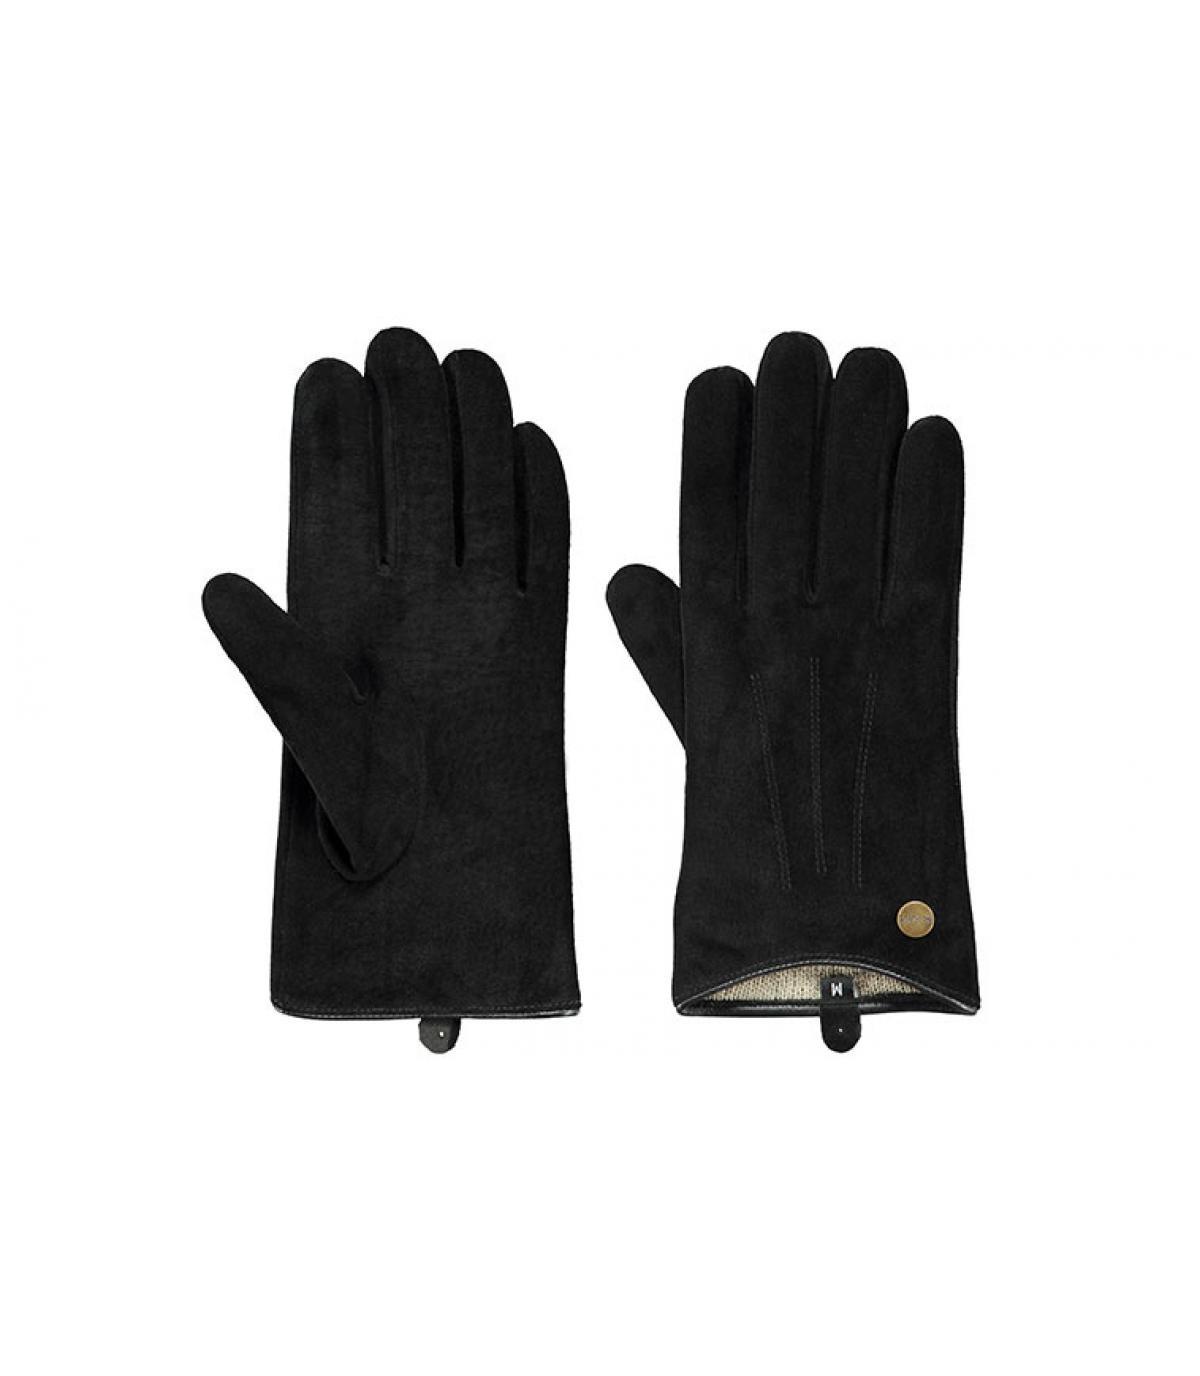 Details Christina Gloves black - Abbildung 2